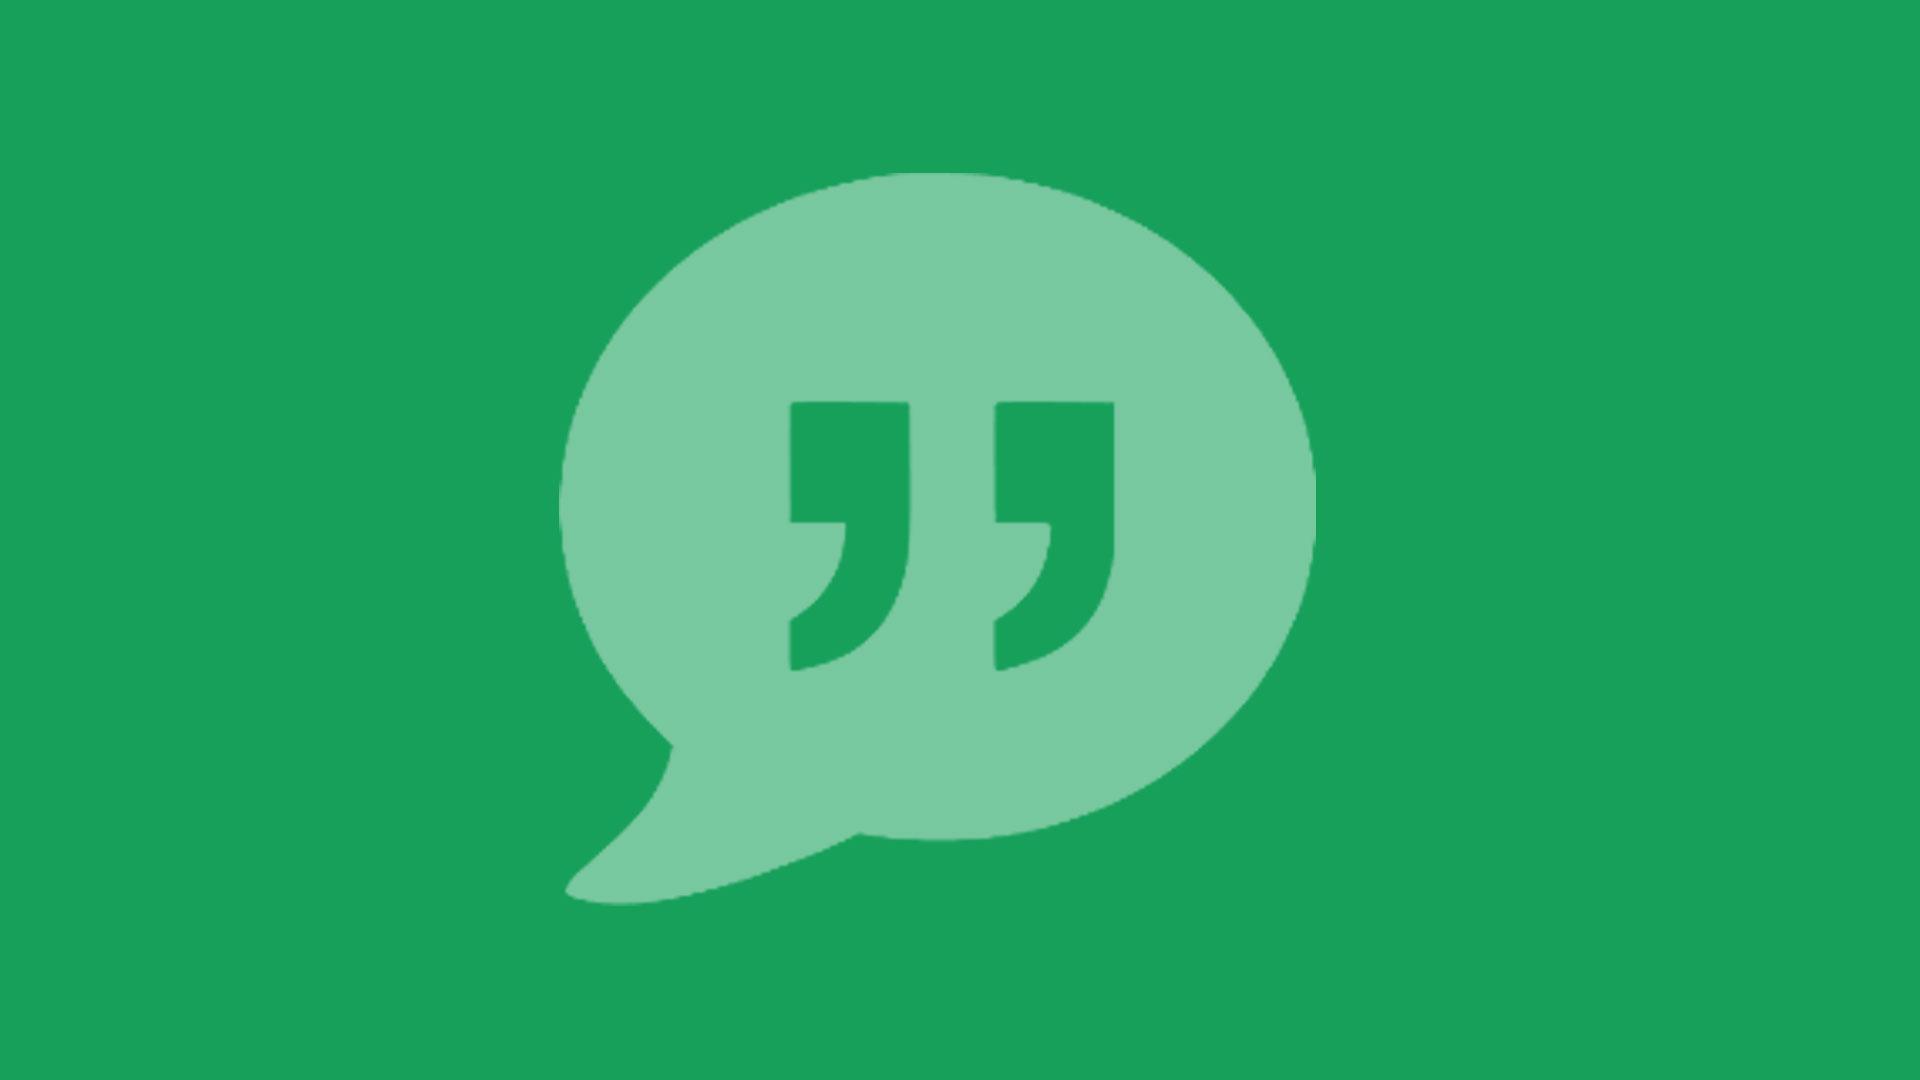 Quran Recitation, Translation, Tafseer, Islamic Videos, Islamic